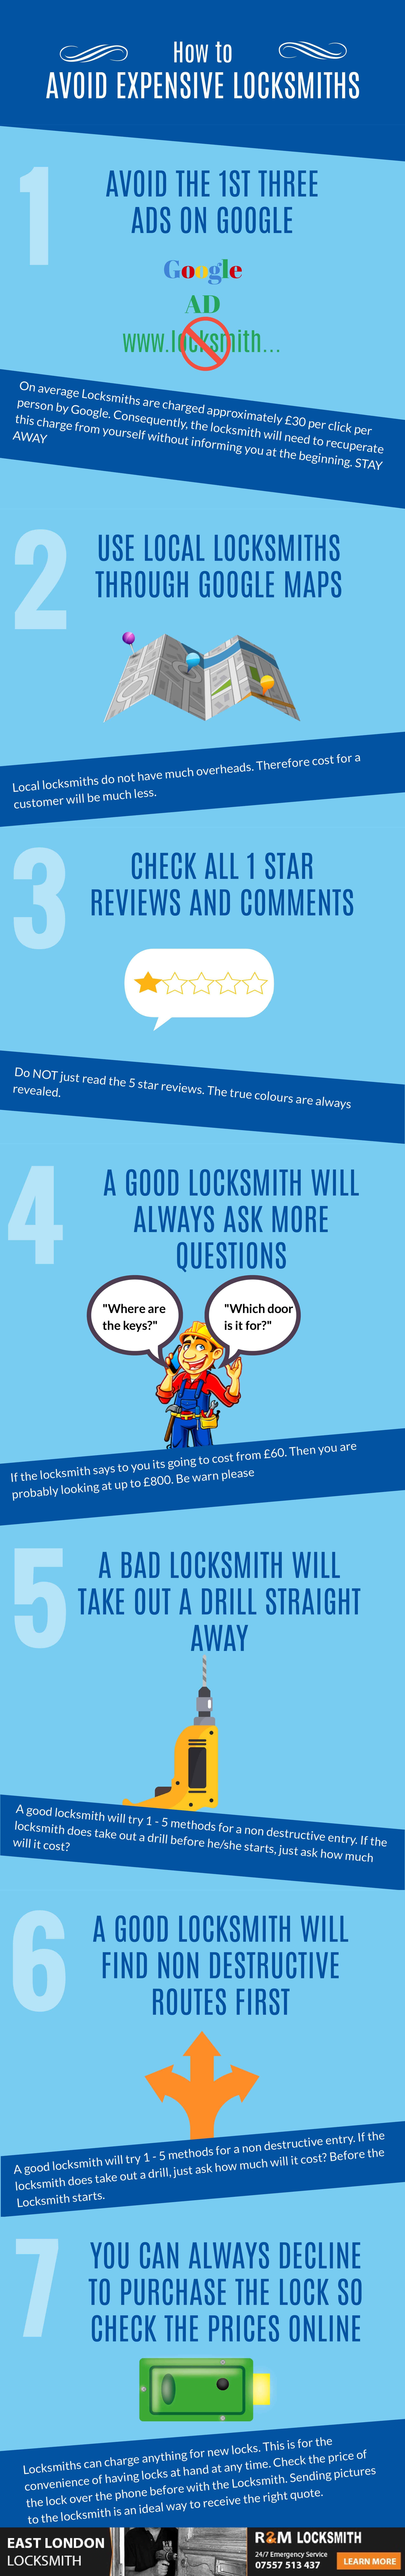 Avoiding Expensive London Locksmith